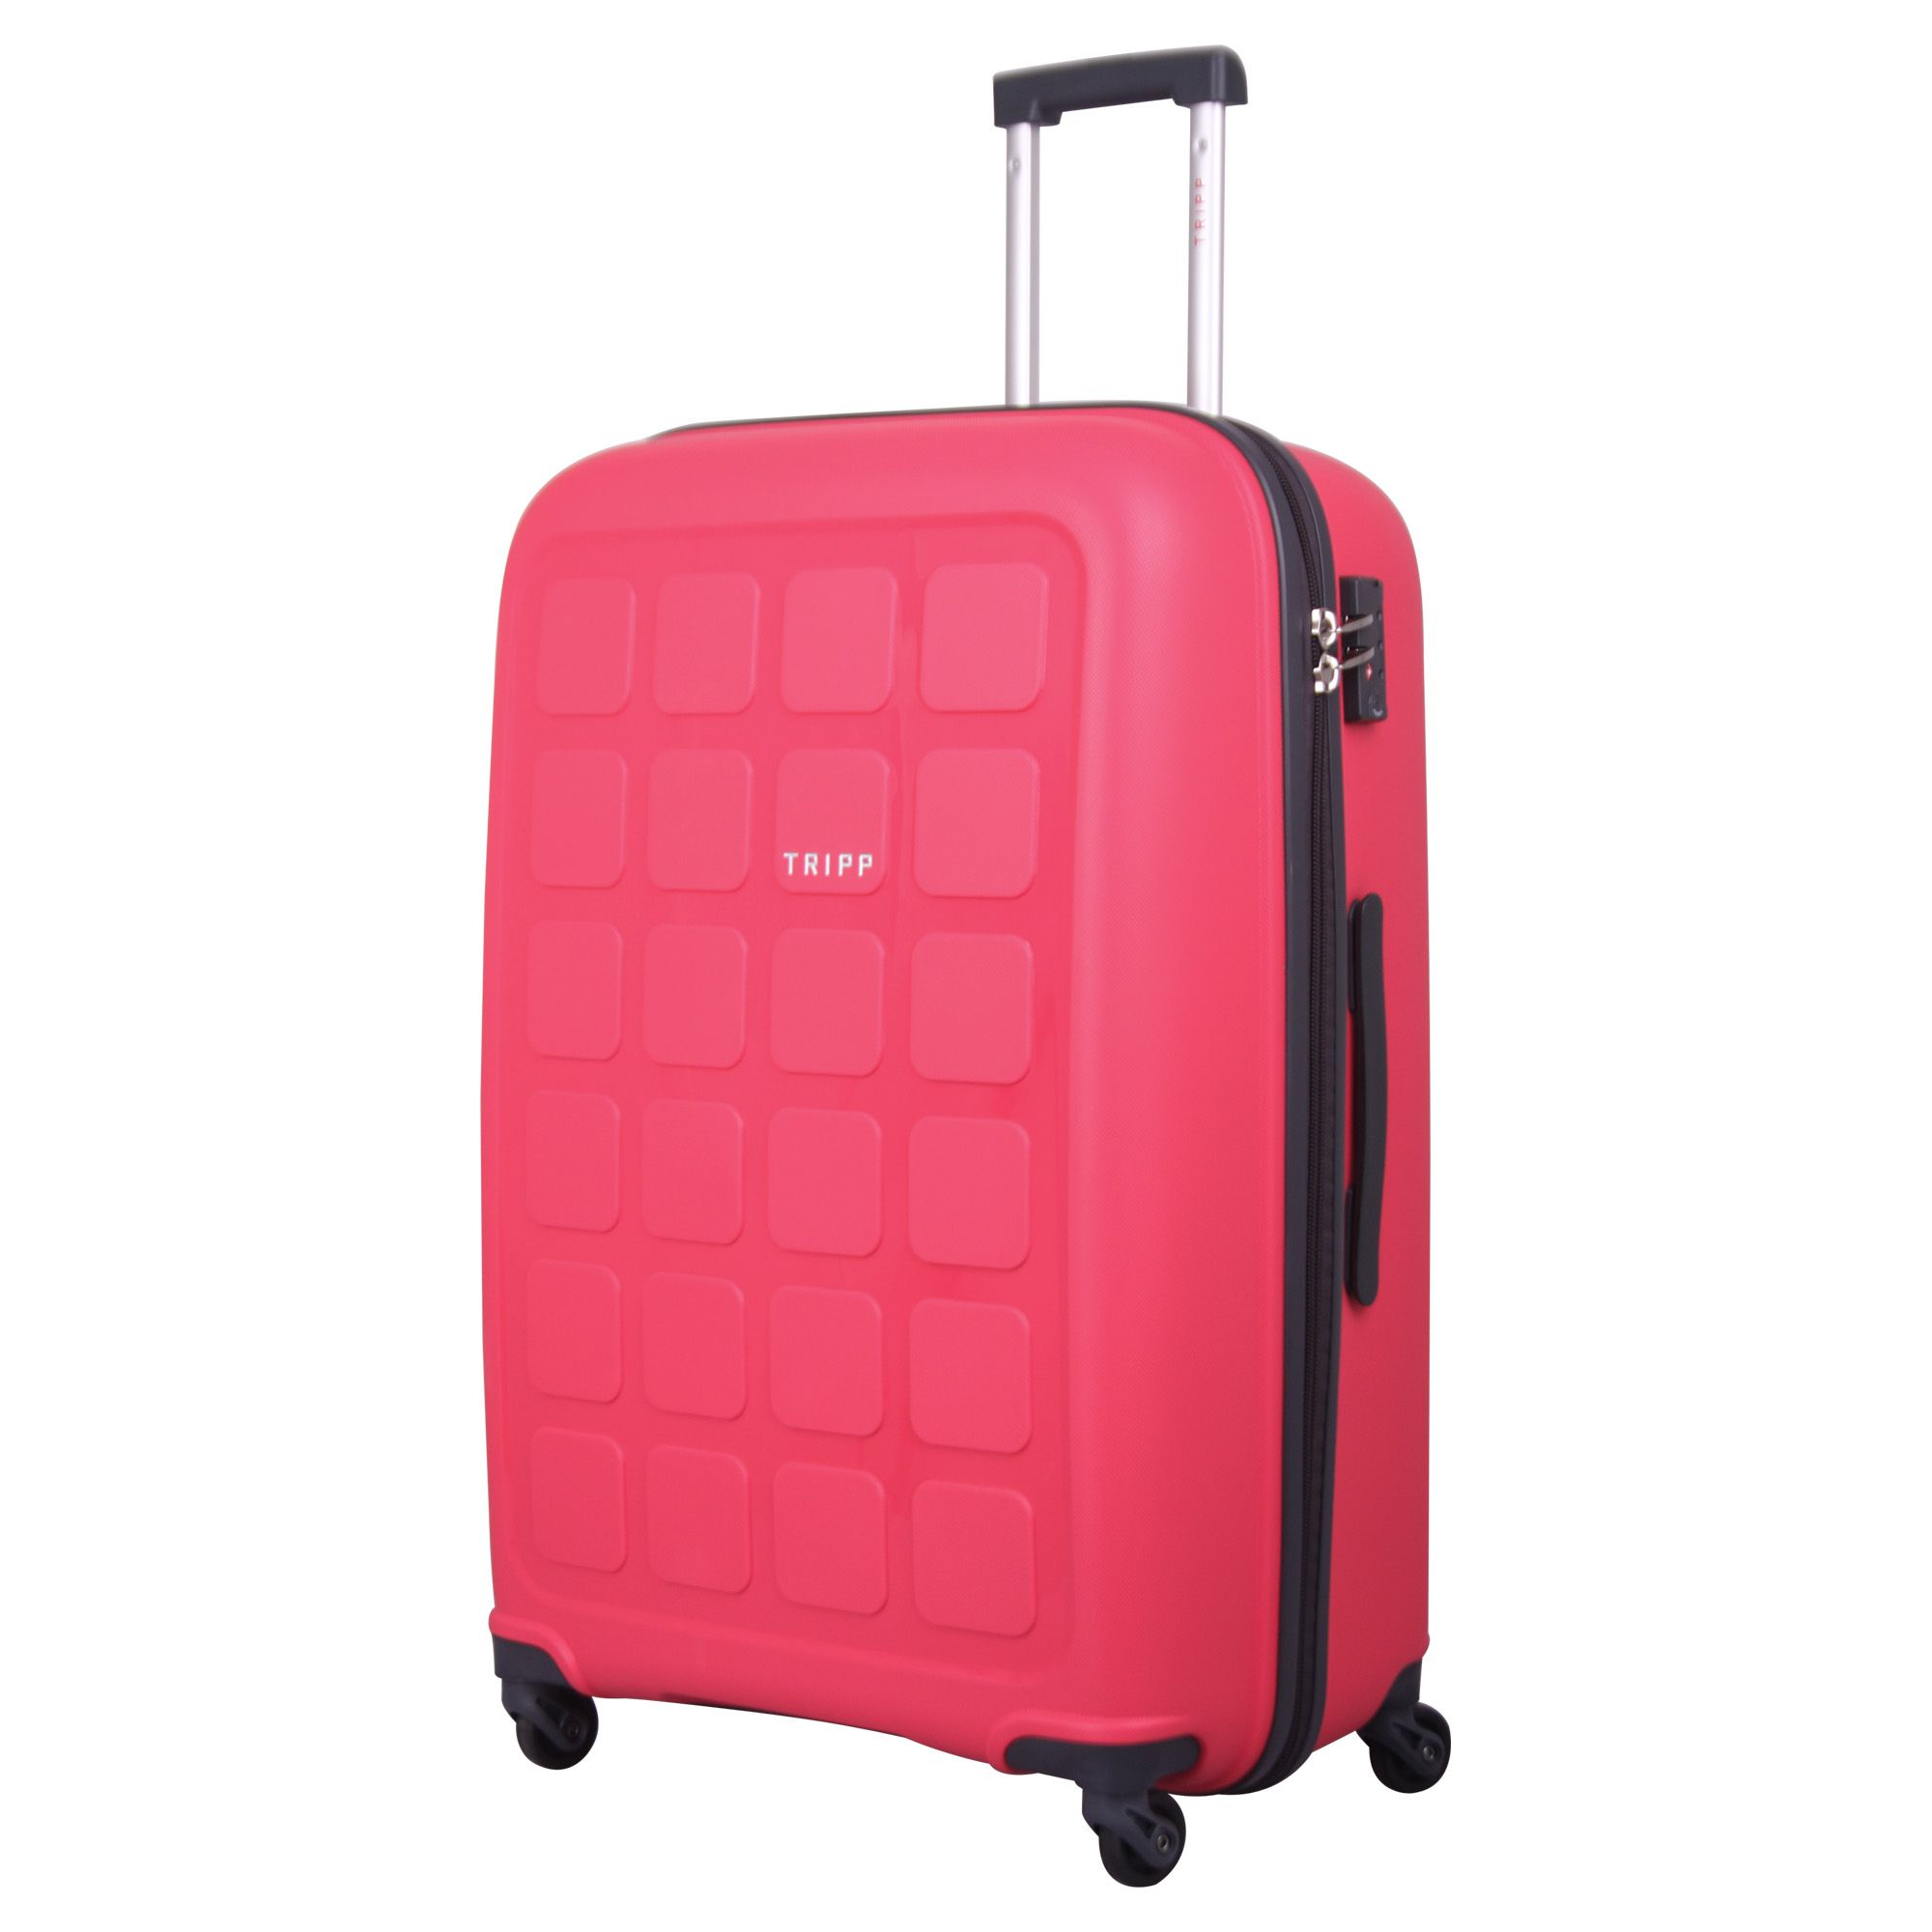 tripp raspberry 39 holiday 6 39 large 4 wheel suitcase hard. Black Bedroom Furniture Sets. Home Design Ideas